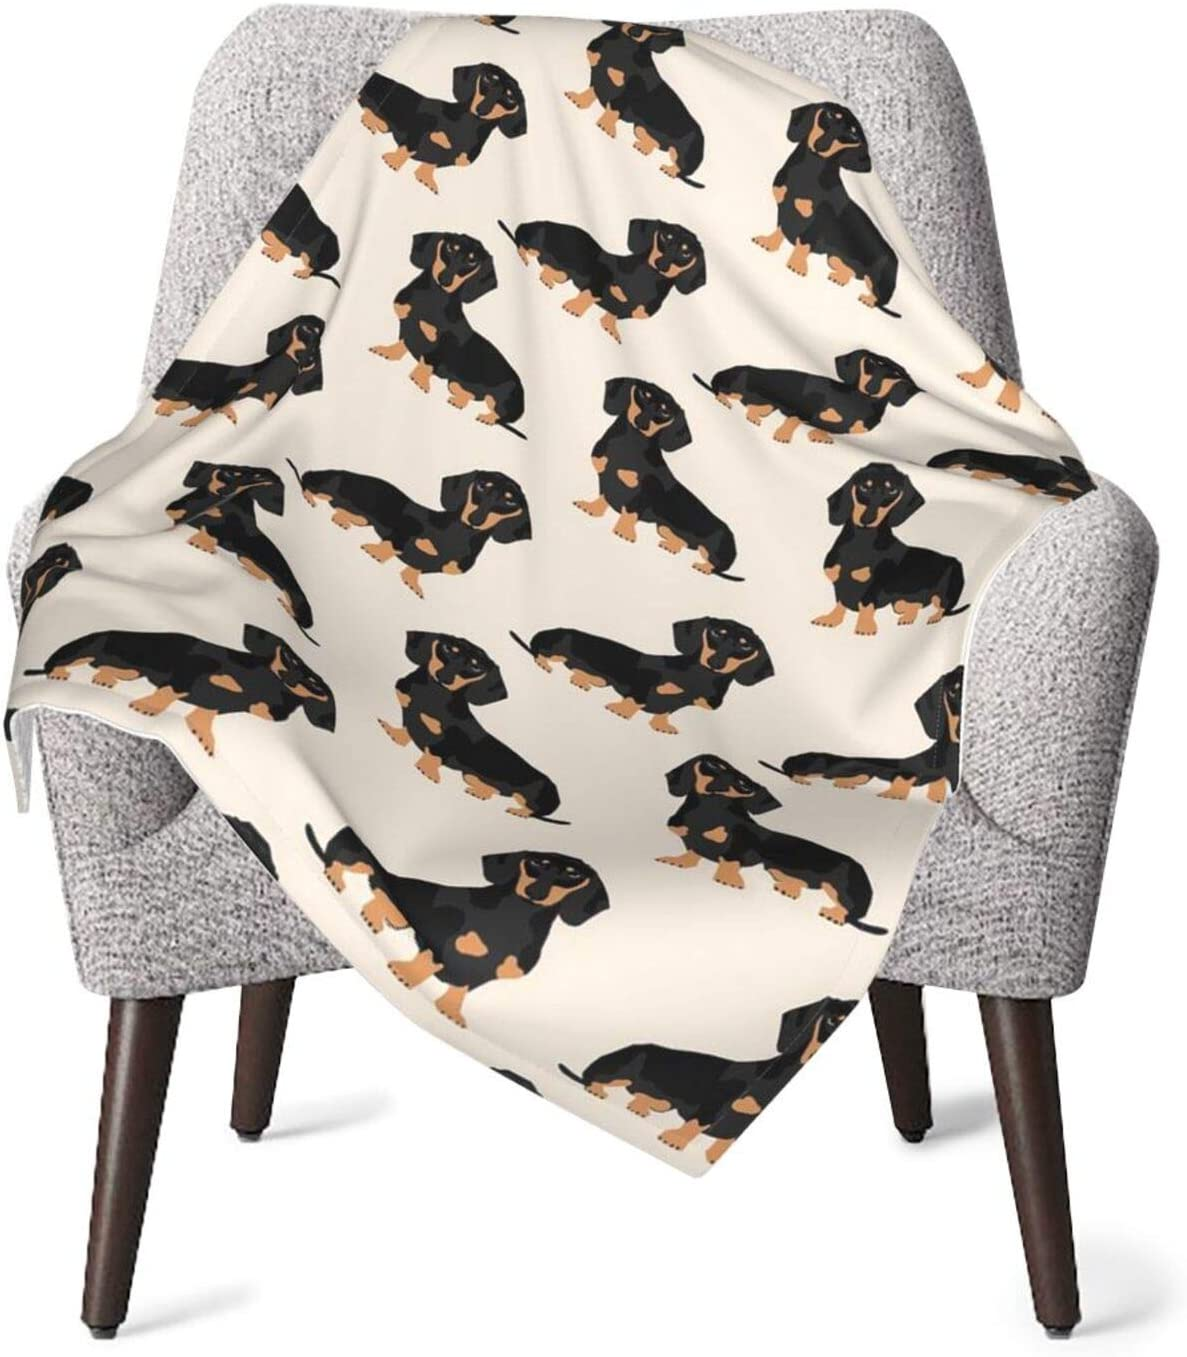 Doxie Cheap mail order shopping Dachshund Weiner Dog Flannel Fleece Blanket New Free Shipping Soft Wa Throw